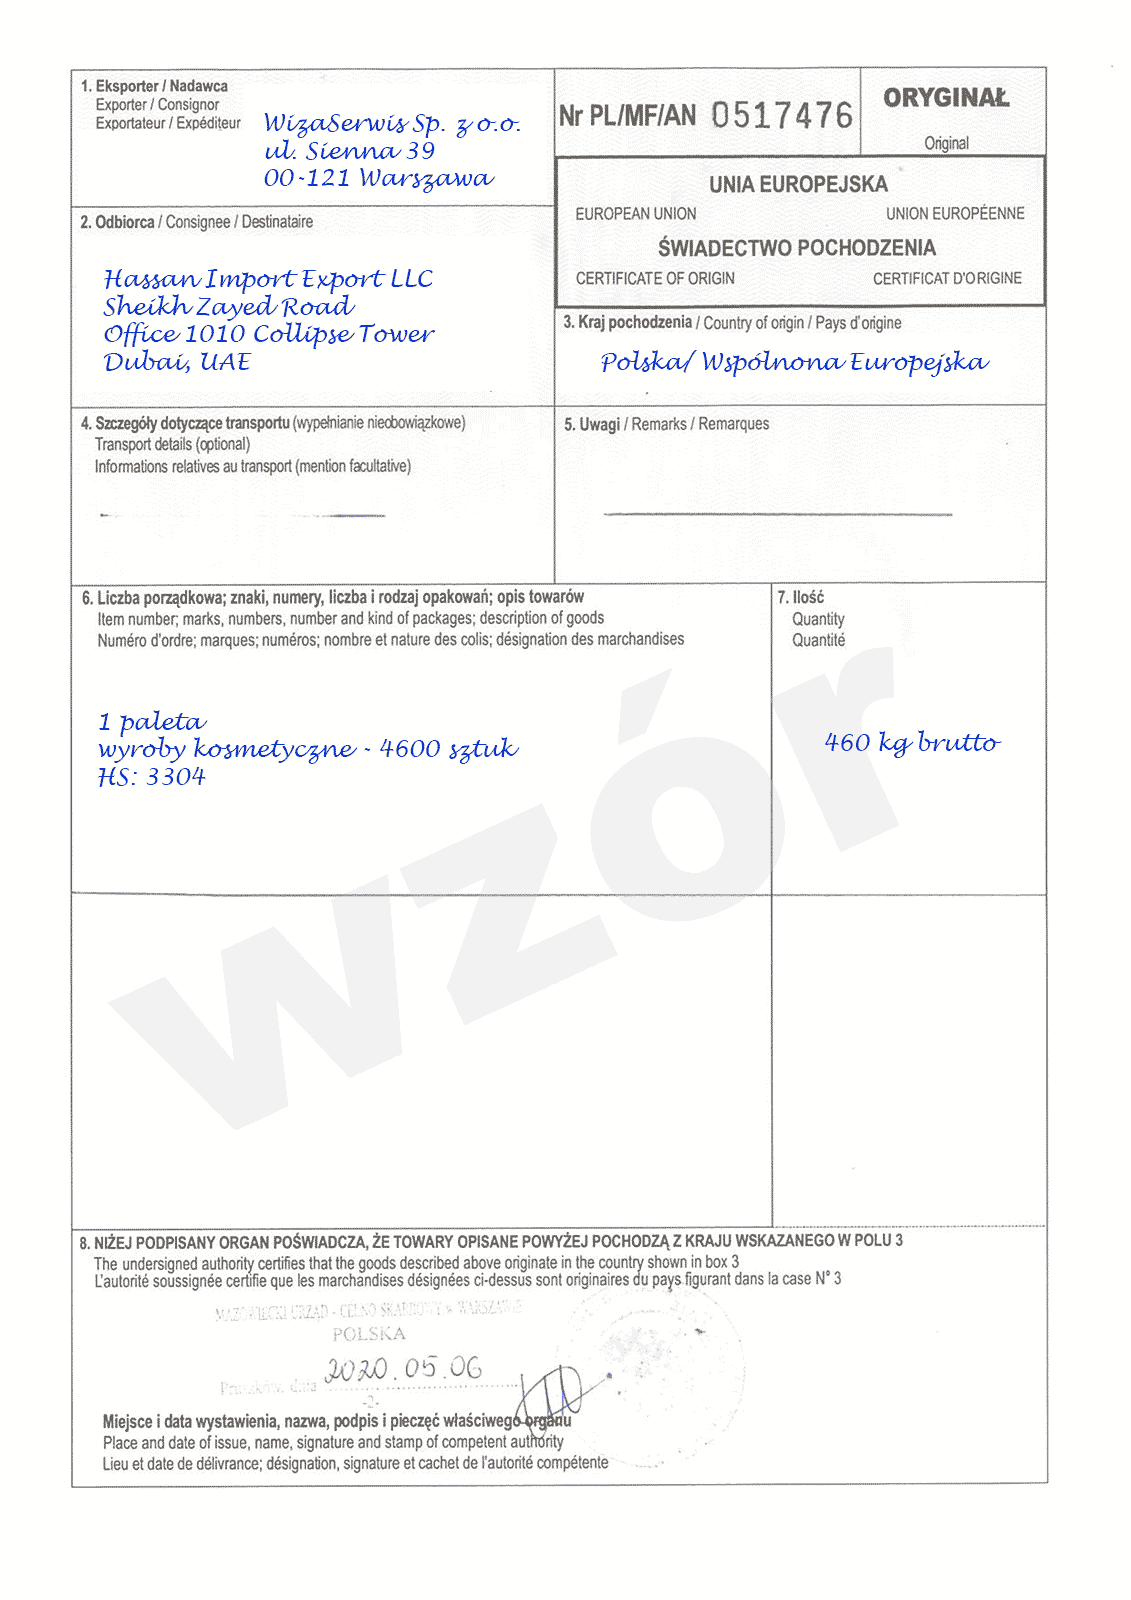 Certificate of origin - Certfikat pochodzenia